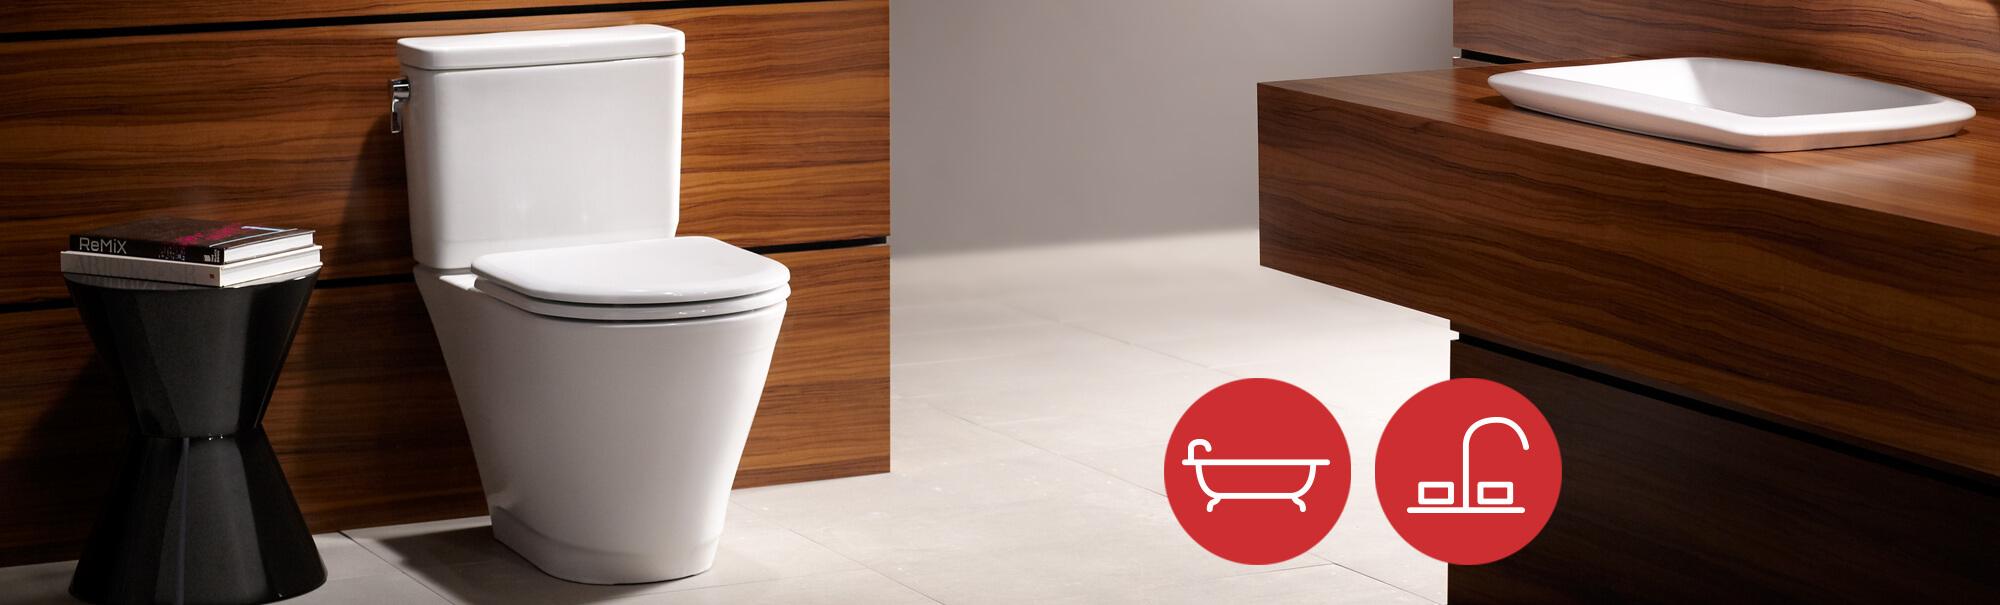 Low-flush toilet